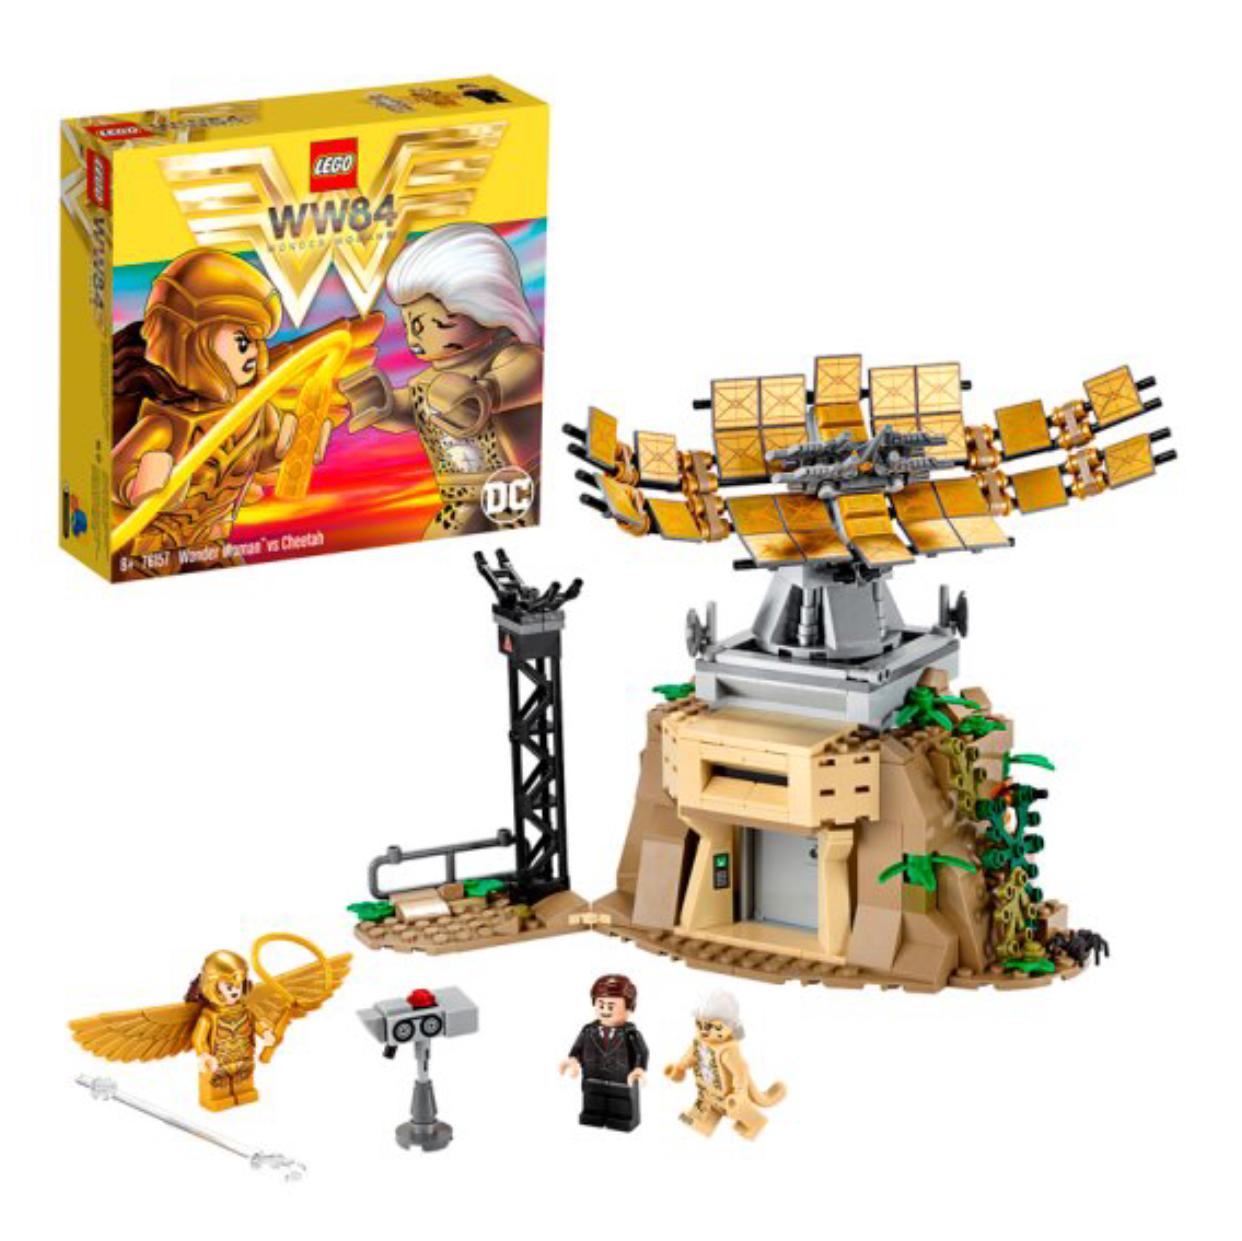 LEGO Wonder Woman Vs Cheetah 76157 - £17.50 at Tesco